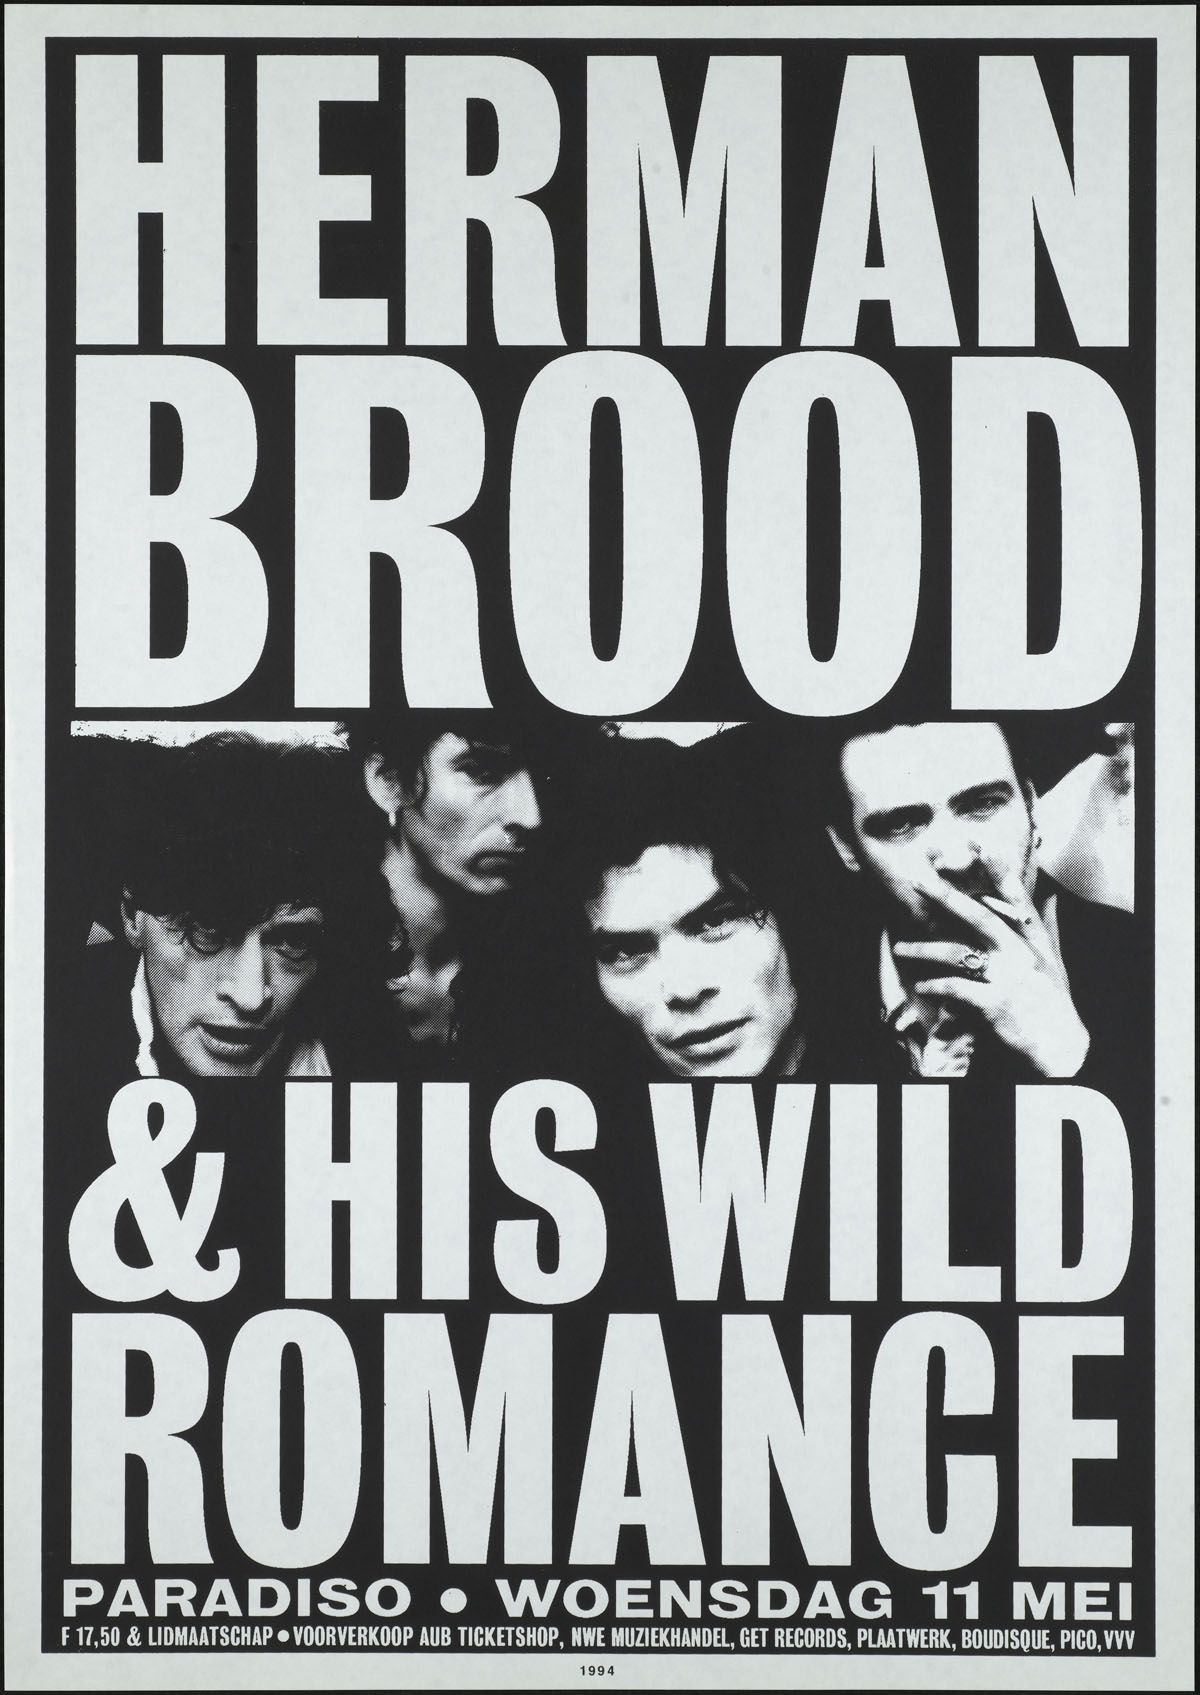 Herman Brood and his Wild Romance